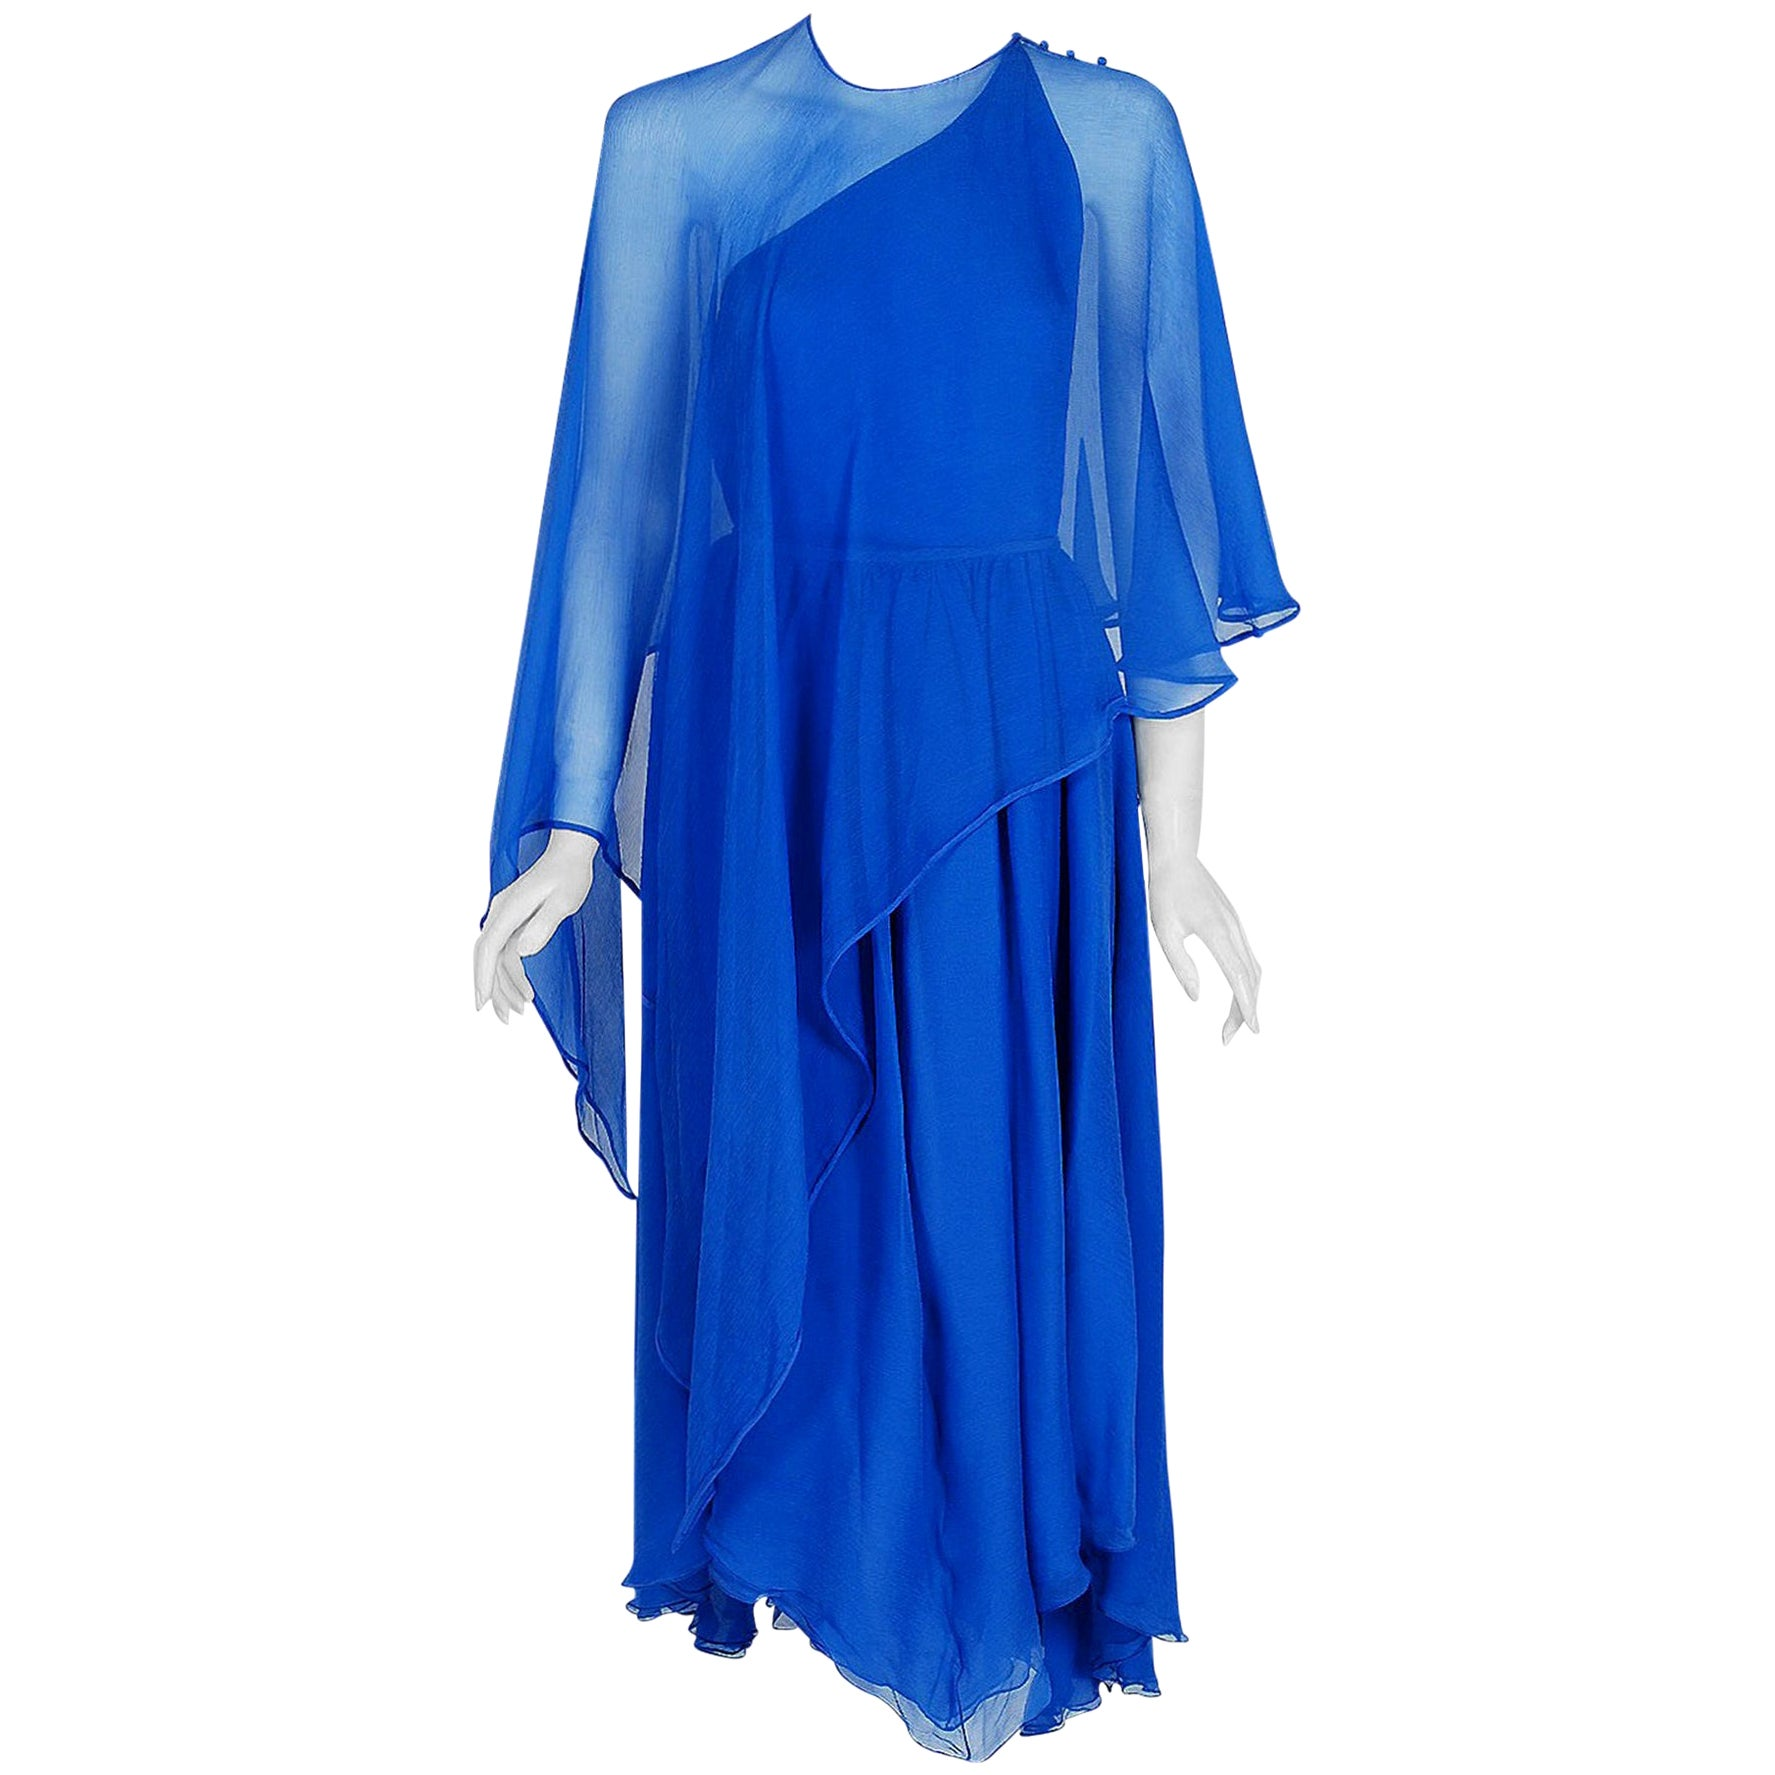 Vintage 1977 Oscar de la Renta Royal-Blue Silk Asymmetric Caftan Blouse & Skirt